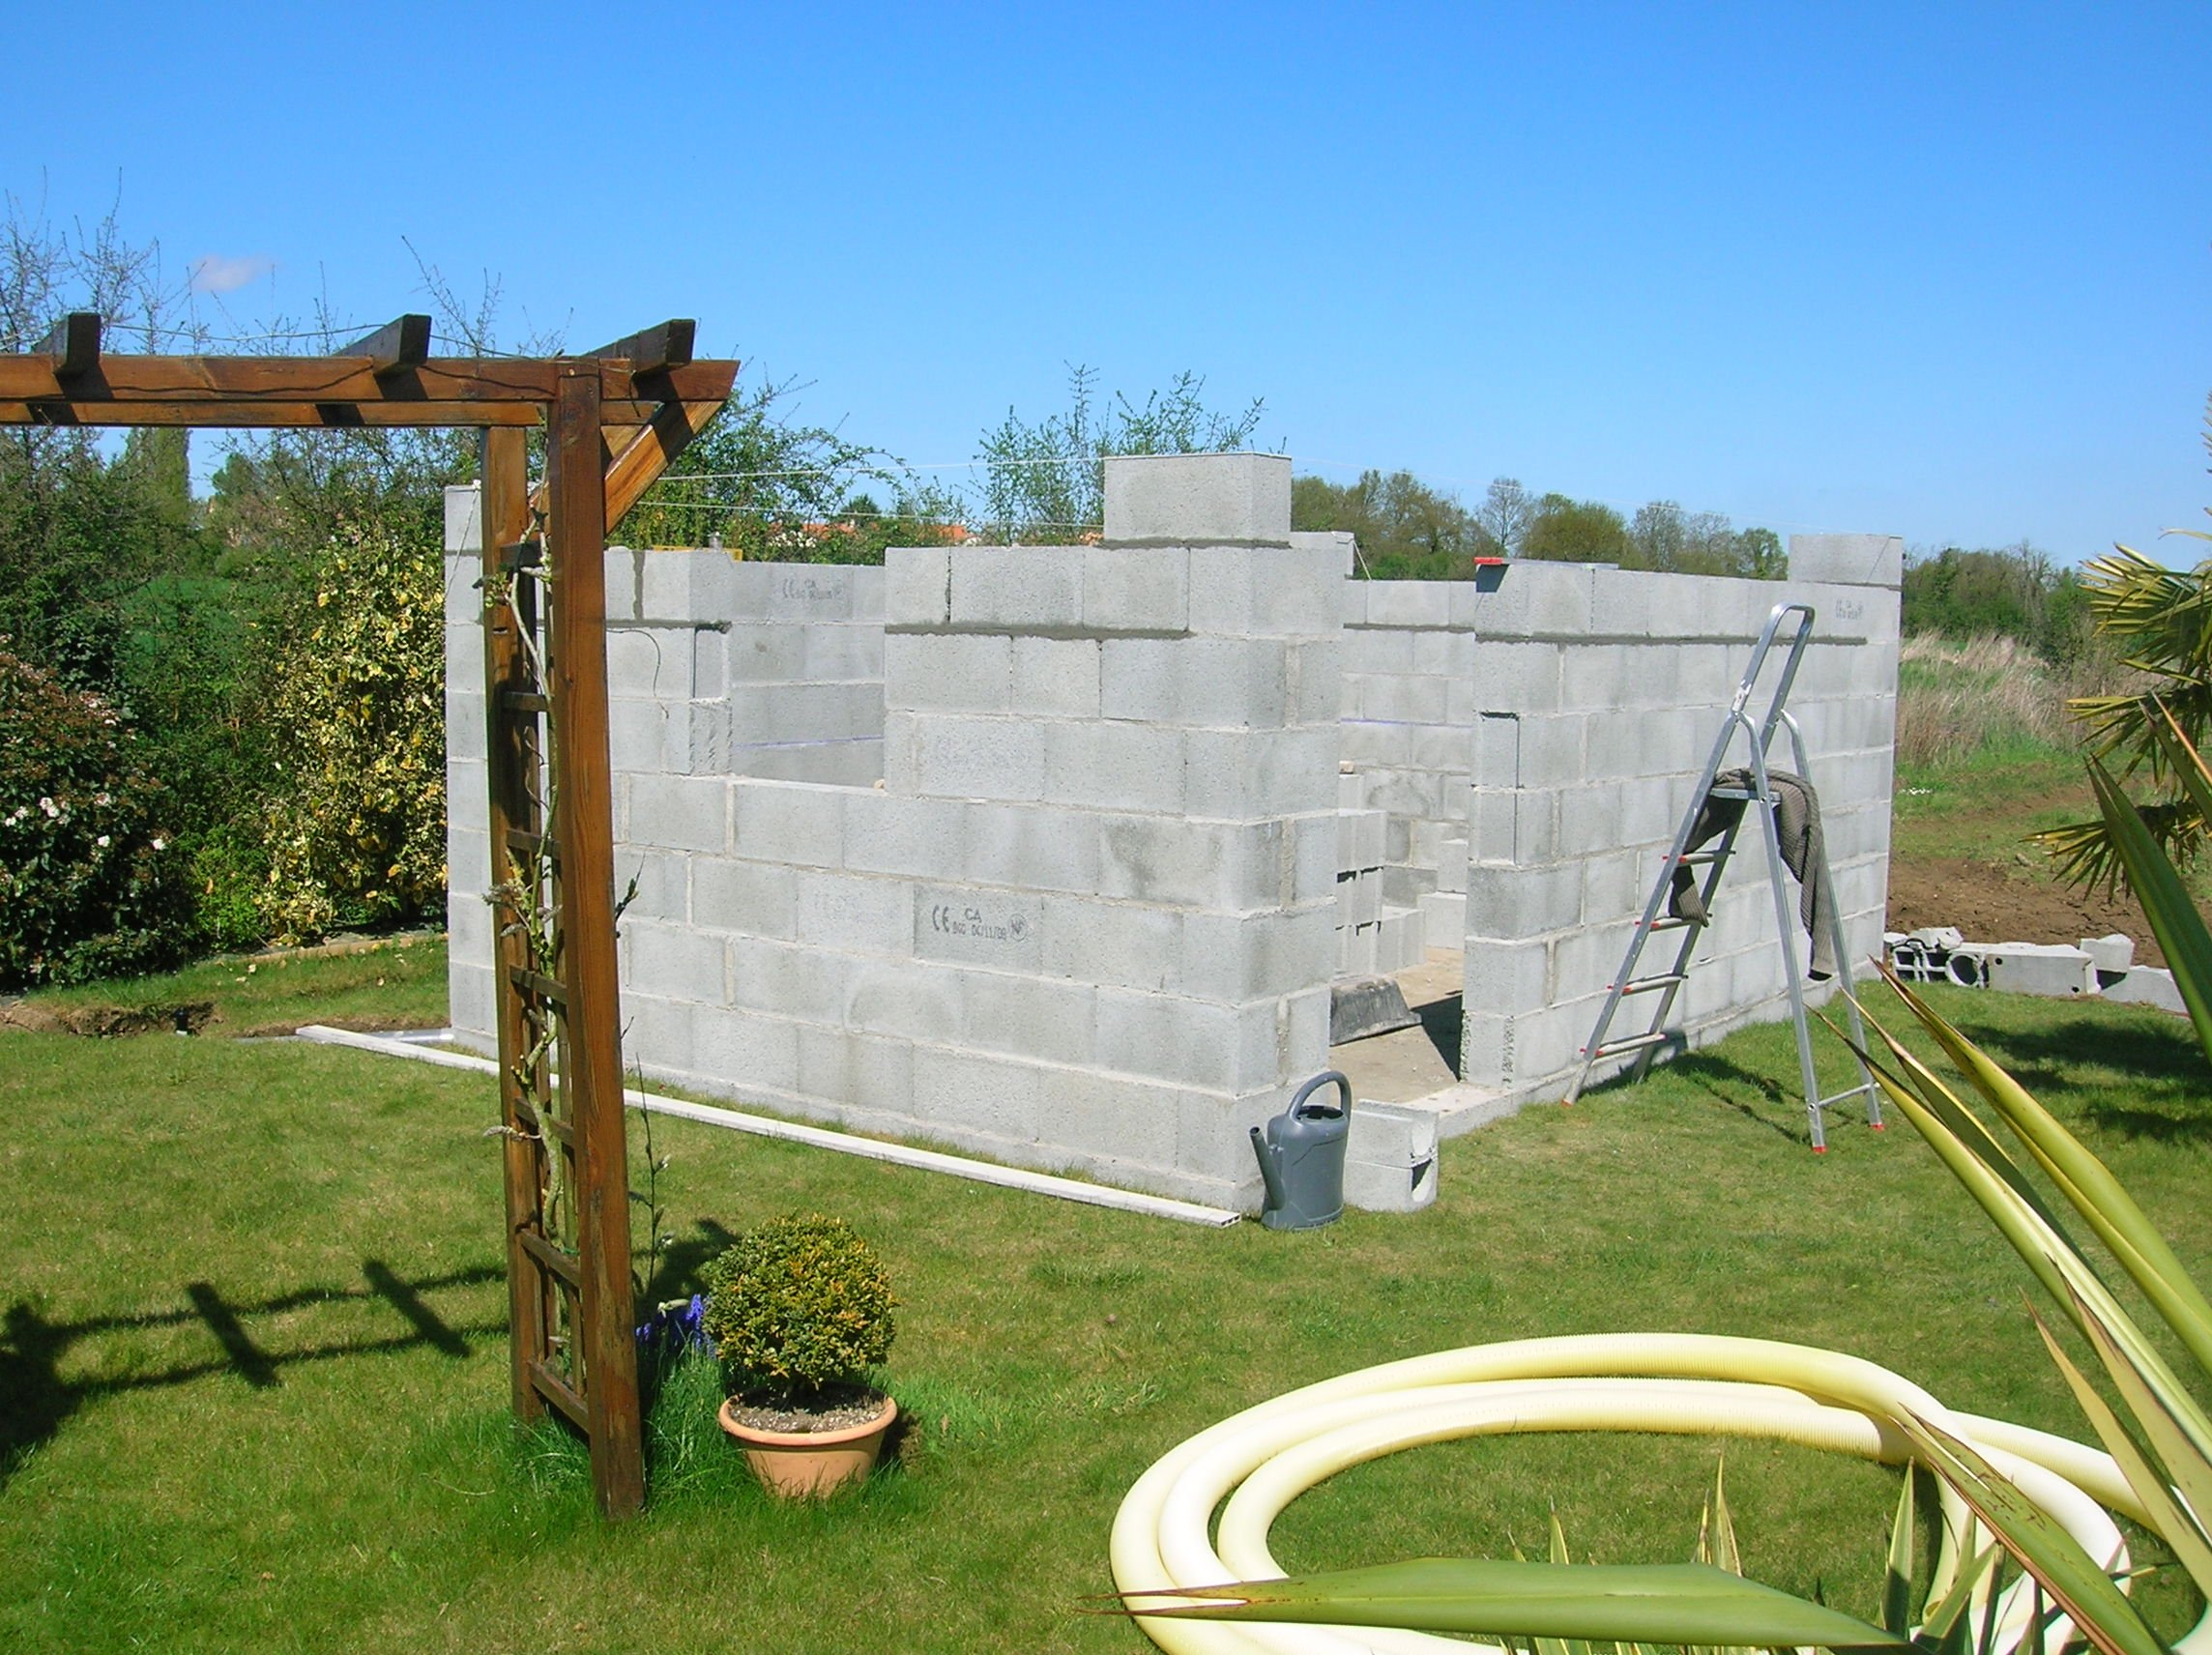 Construction de mon abri de jardin dernier rang de - Construire un abri de jardin en parpaing ...